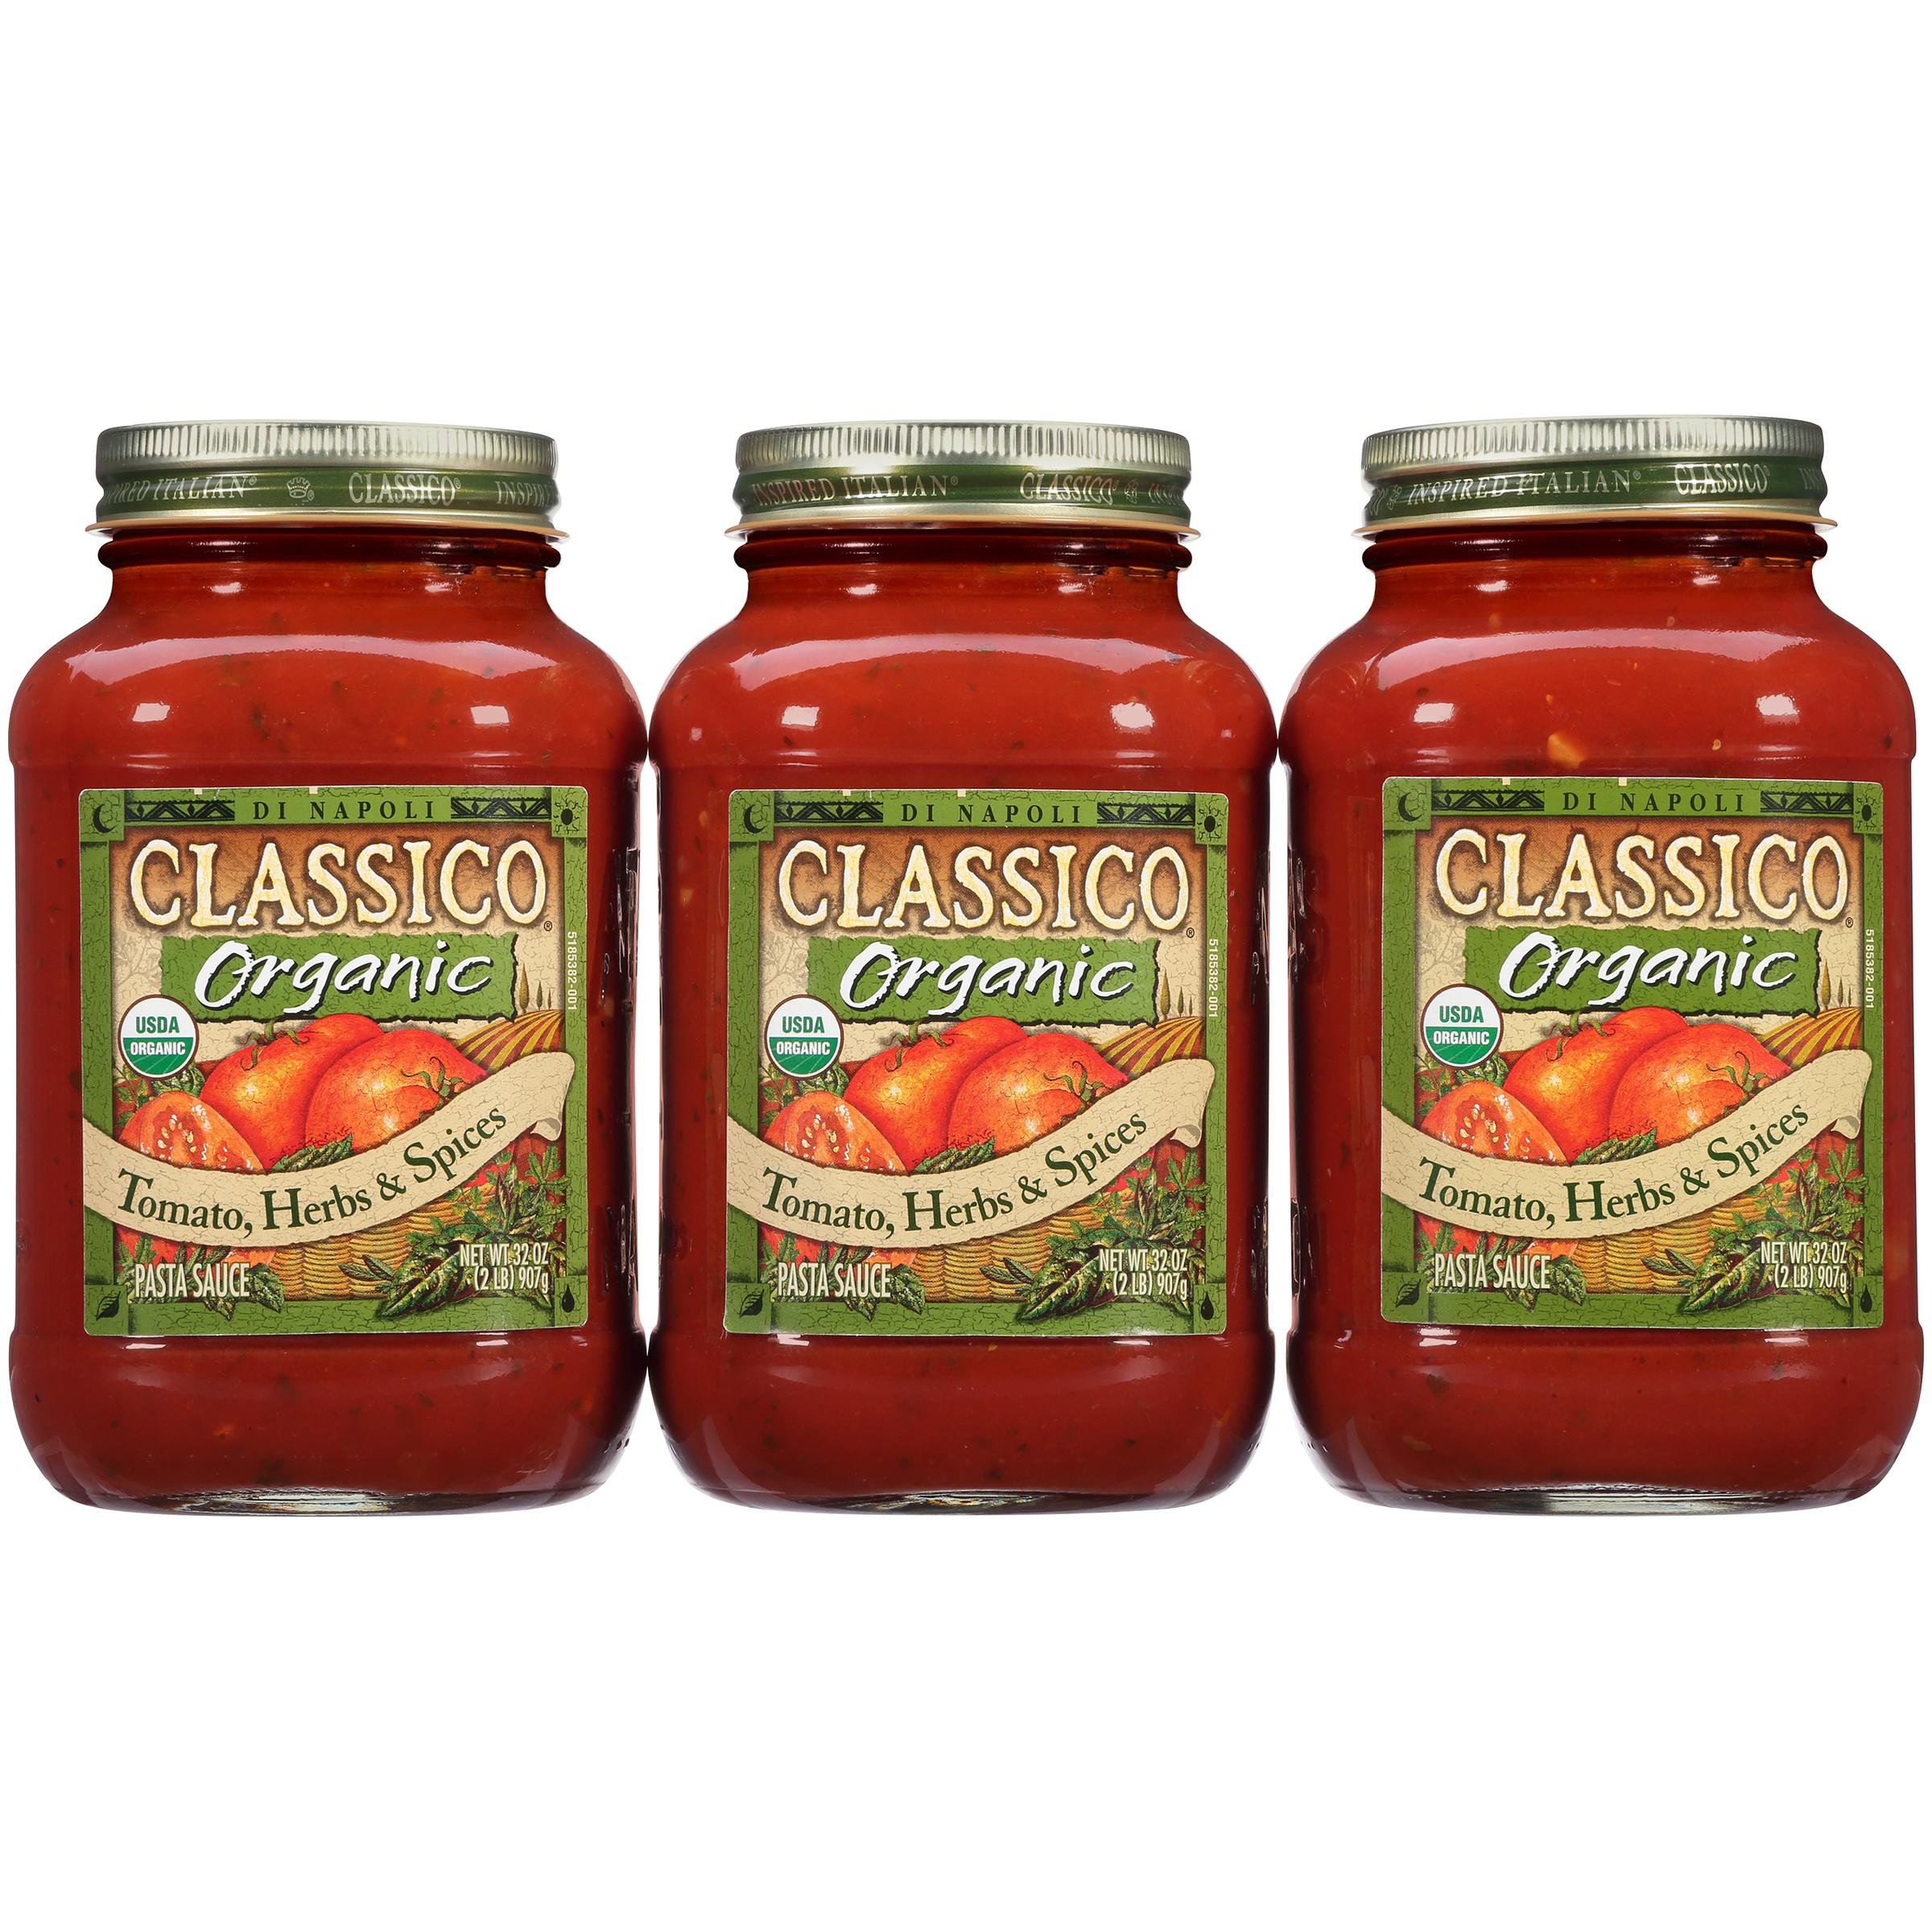 Classico Organic Tomato Herbs and Spices Pasta Sauce